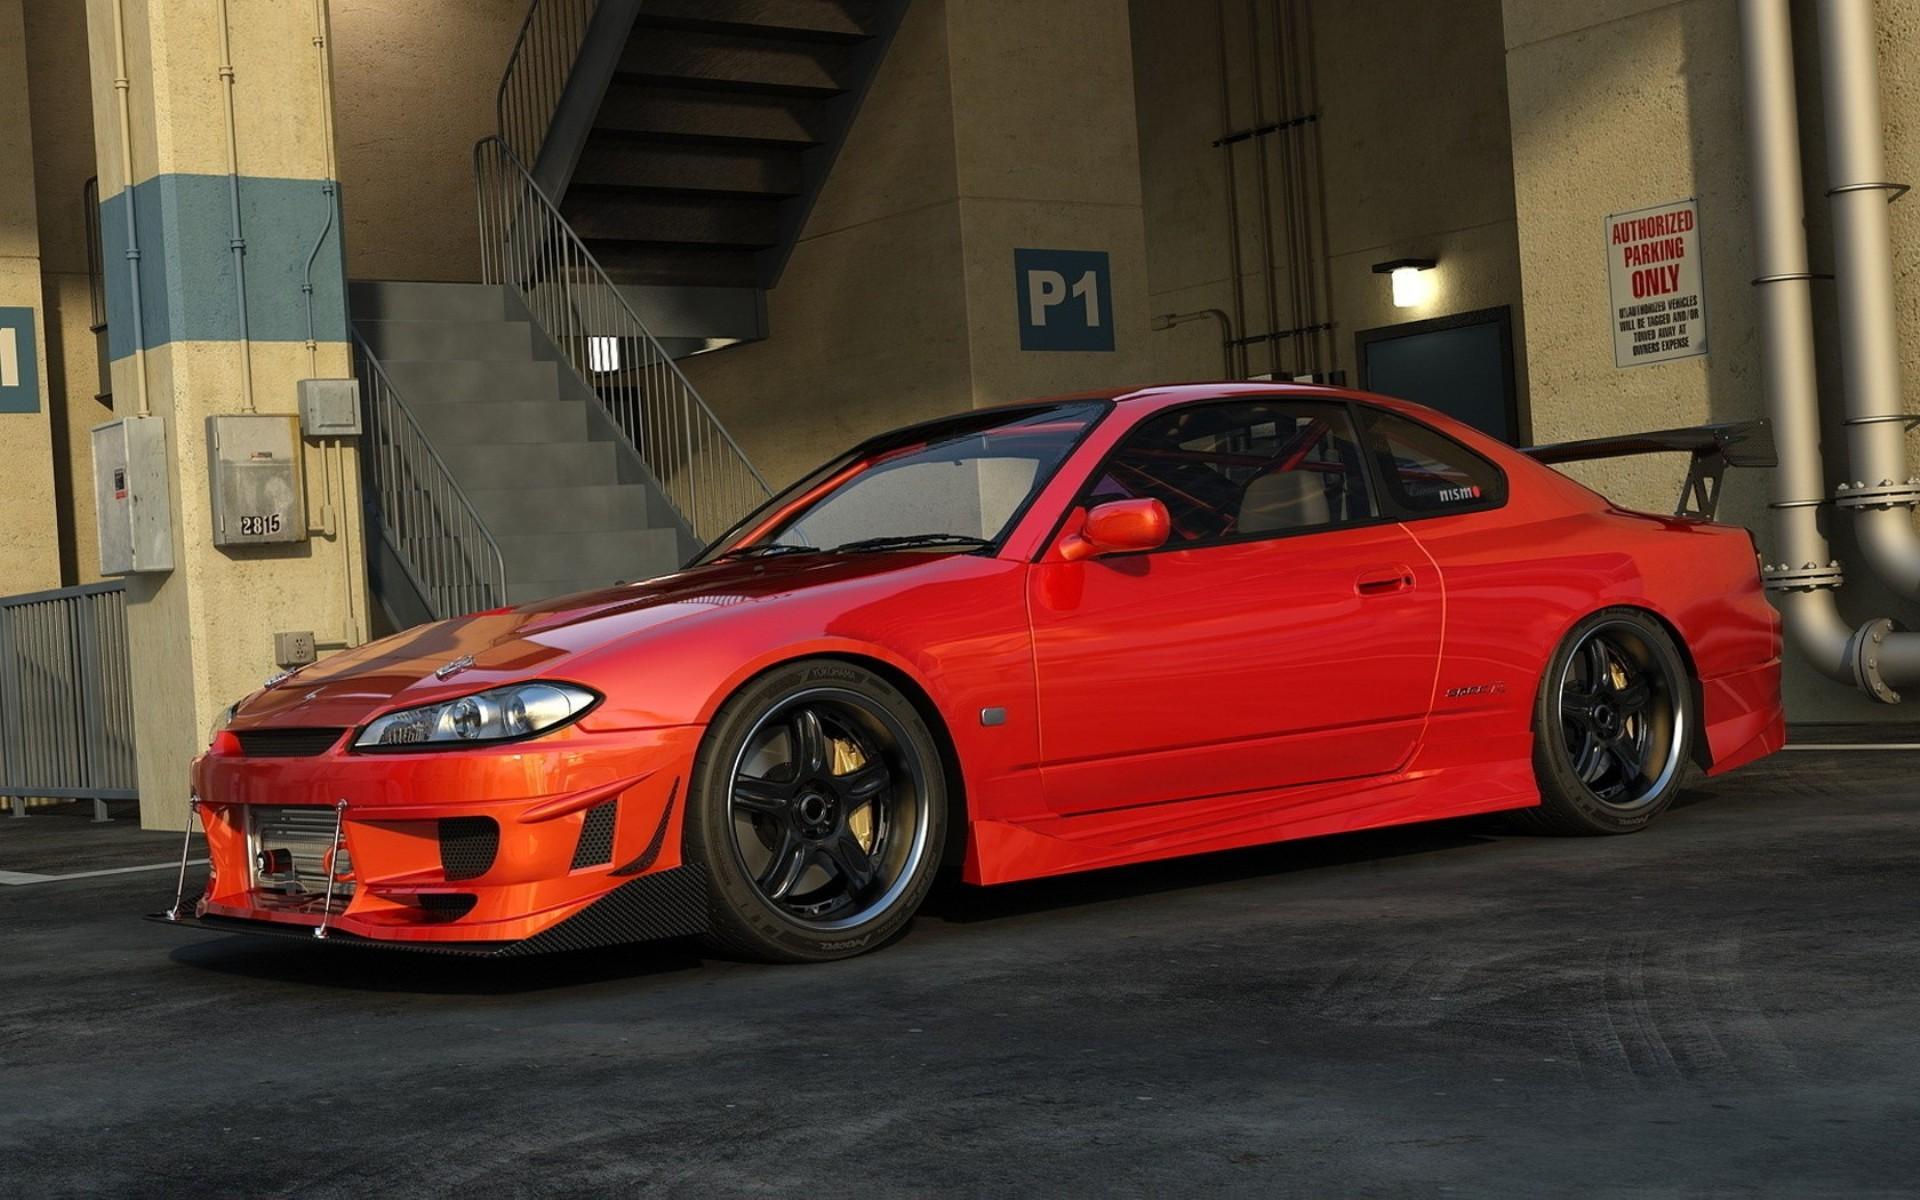 Car Vehicle CGI Nissan JDM Sports Car Tuning Racing Nissan Silvia S15  Convertible Nissan Silvia Performance